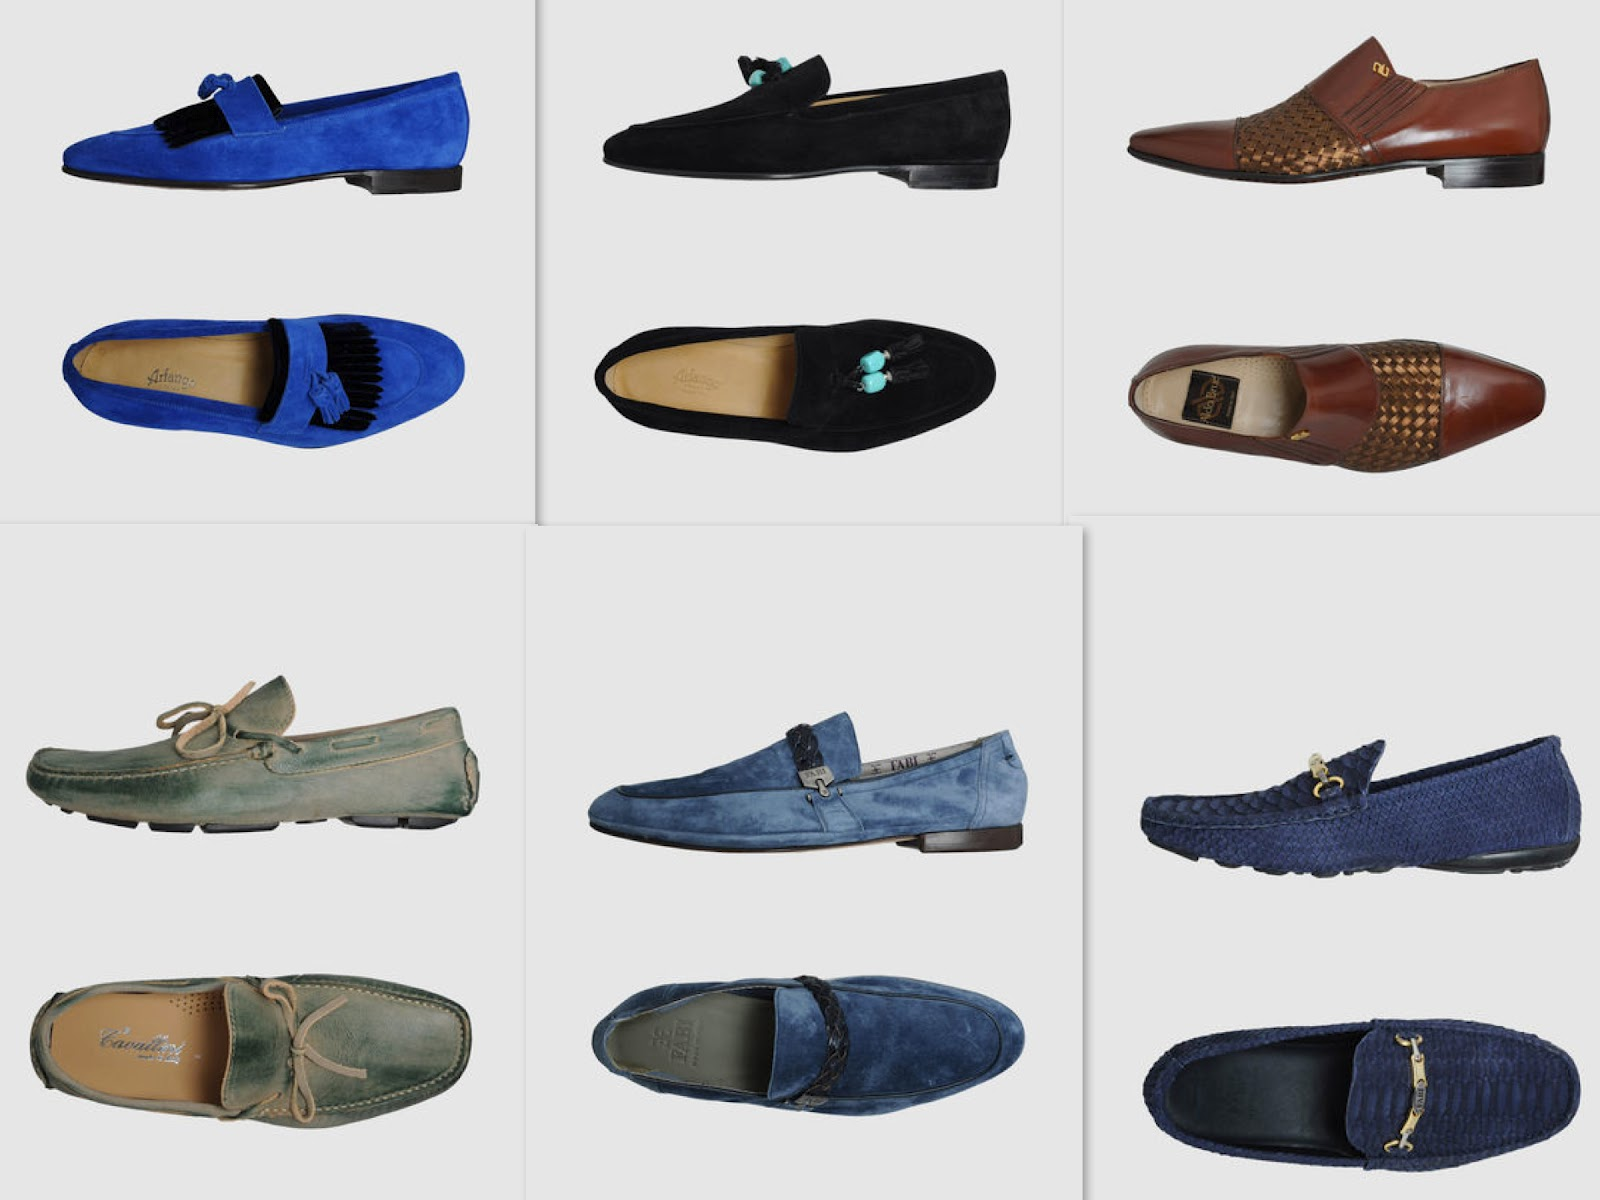 Susana rivera torres zapatos para hombre - Zapatos collage ...